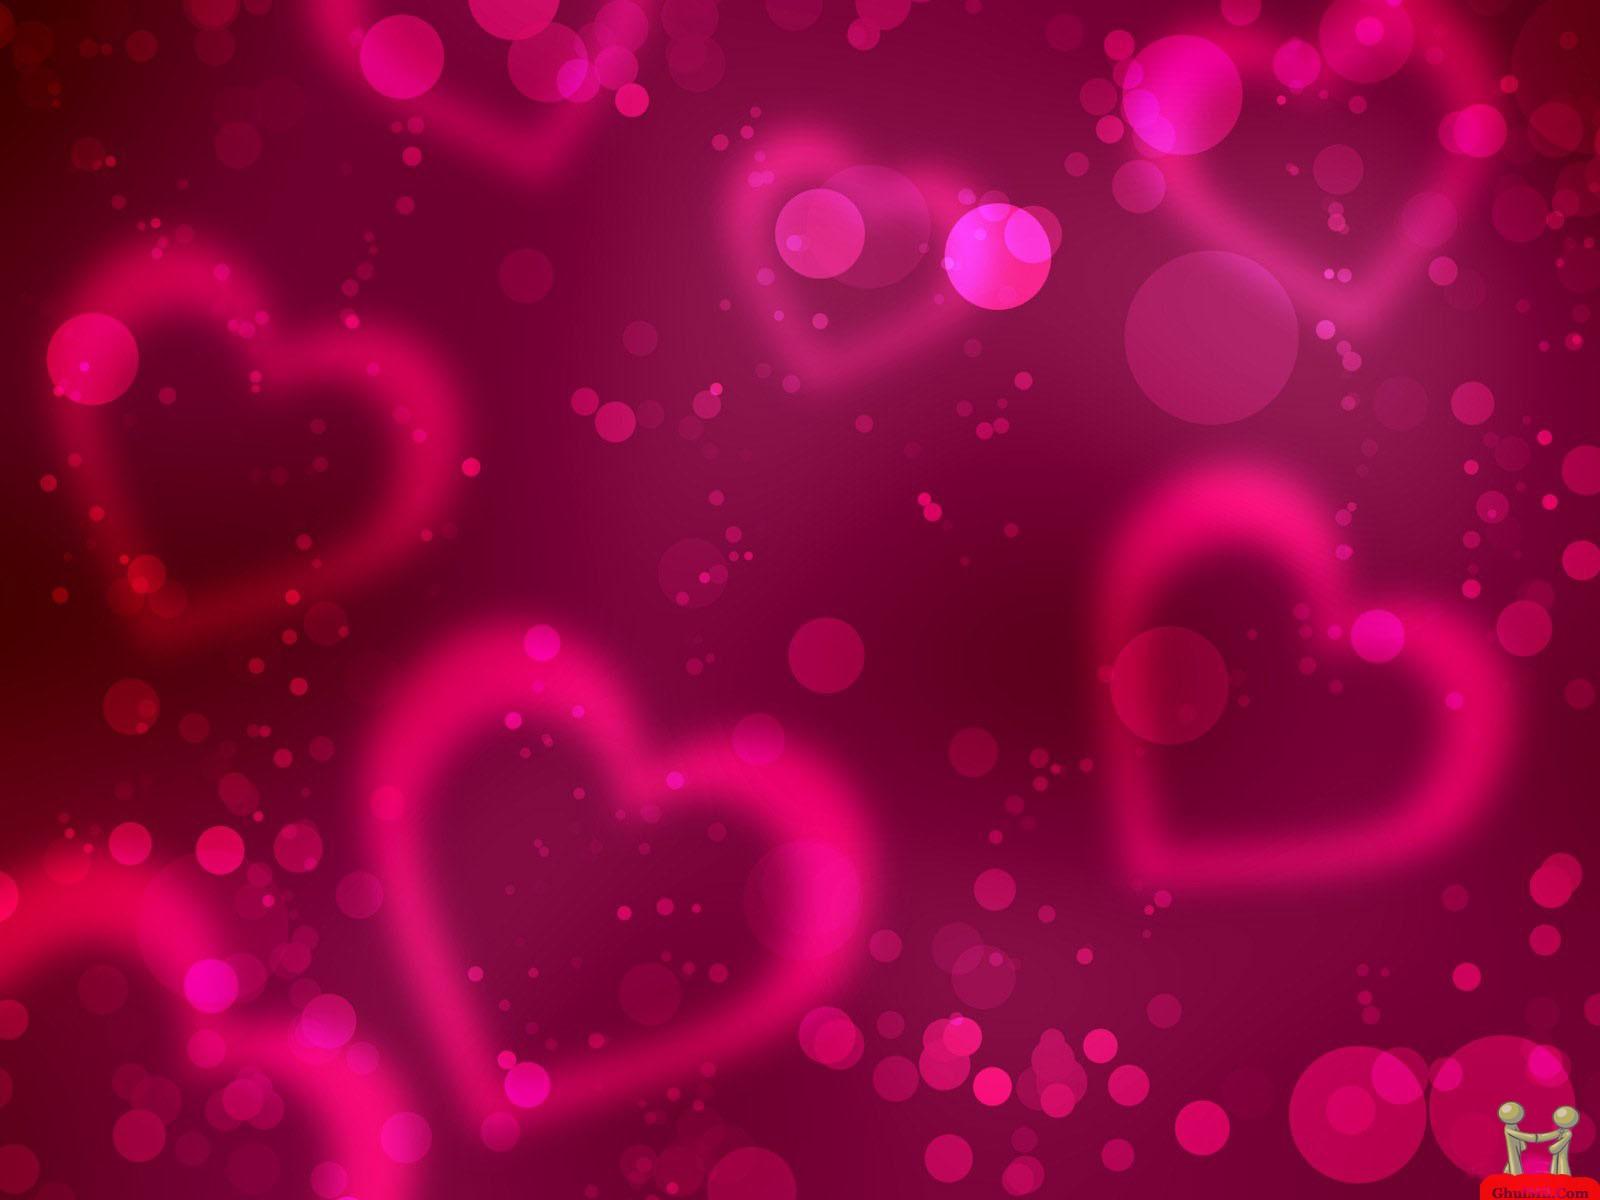 FREE WALLPAPER BEAUTIFUL DESKTOP Valentine Hearts Wallpaper 1600x1200